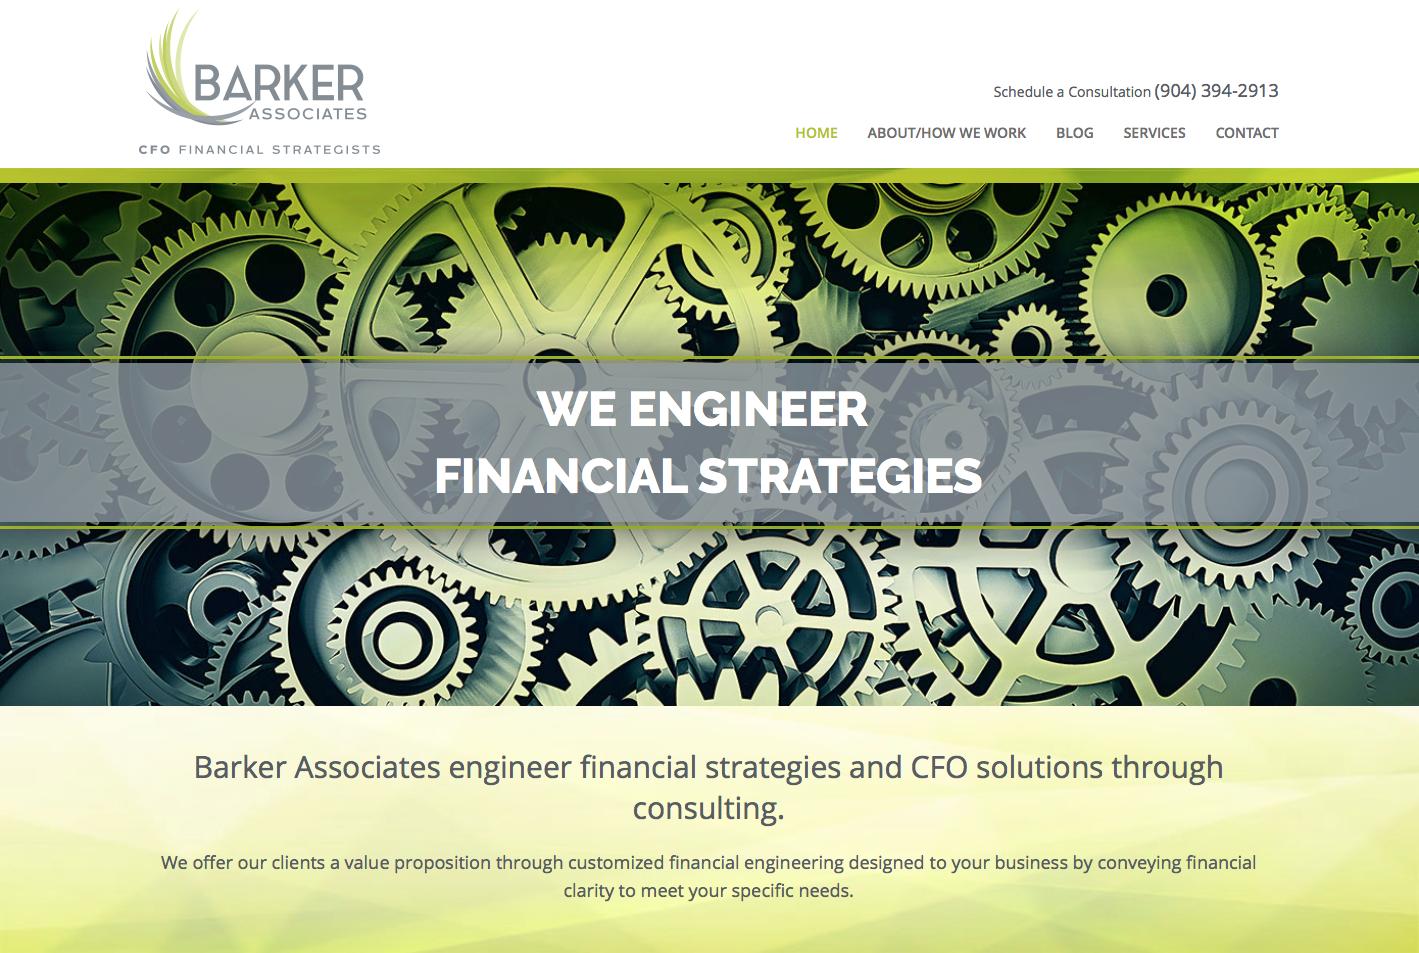 Barker Associates CFO Financial Strategists Website Design